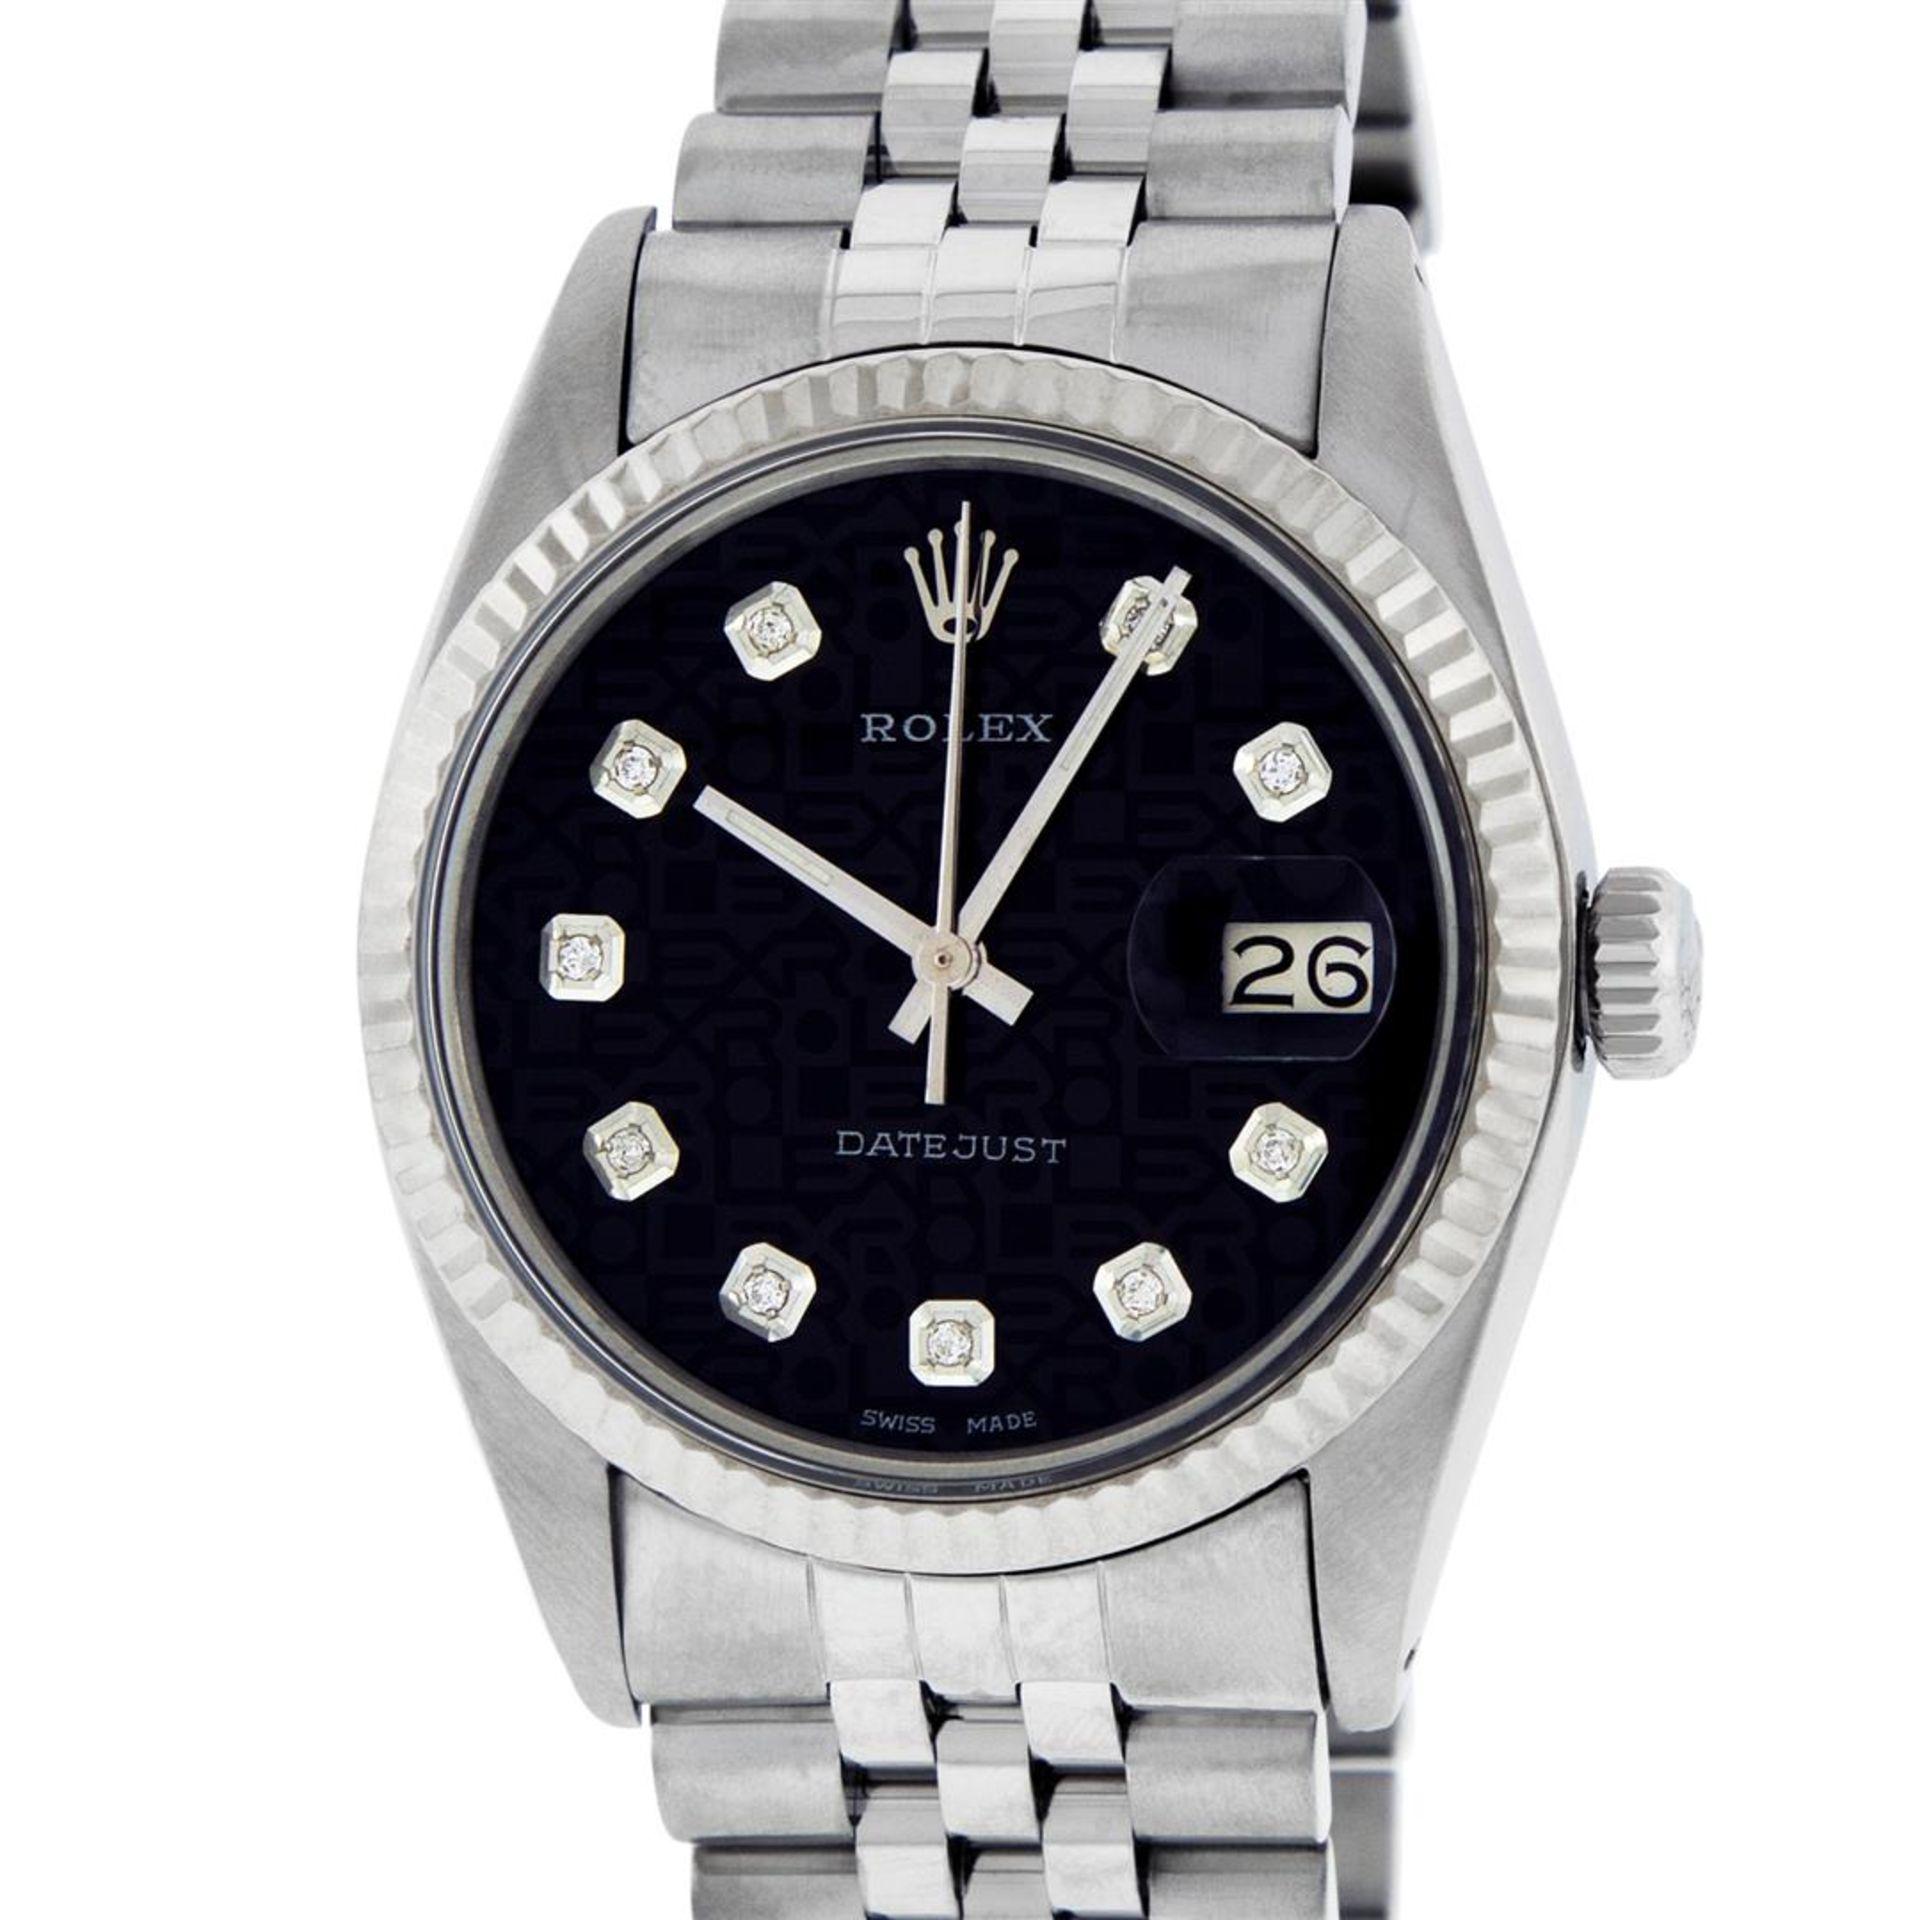 Rolex Mens Stainless Black Diamond 36MM Datejust Wristwatch - Image 3 of 9